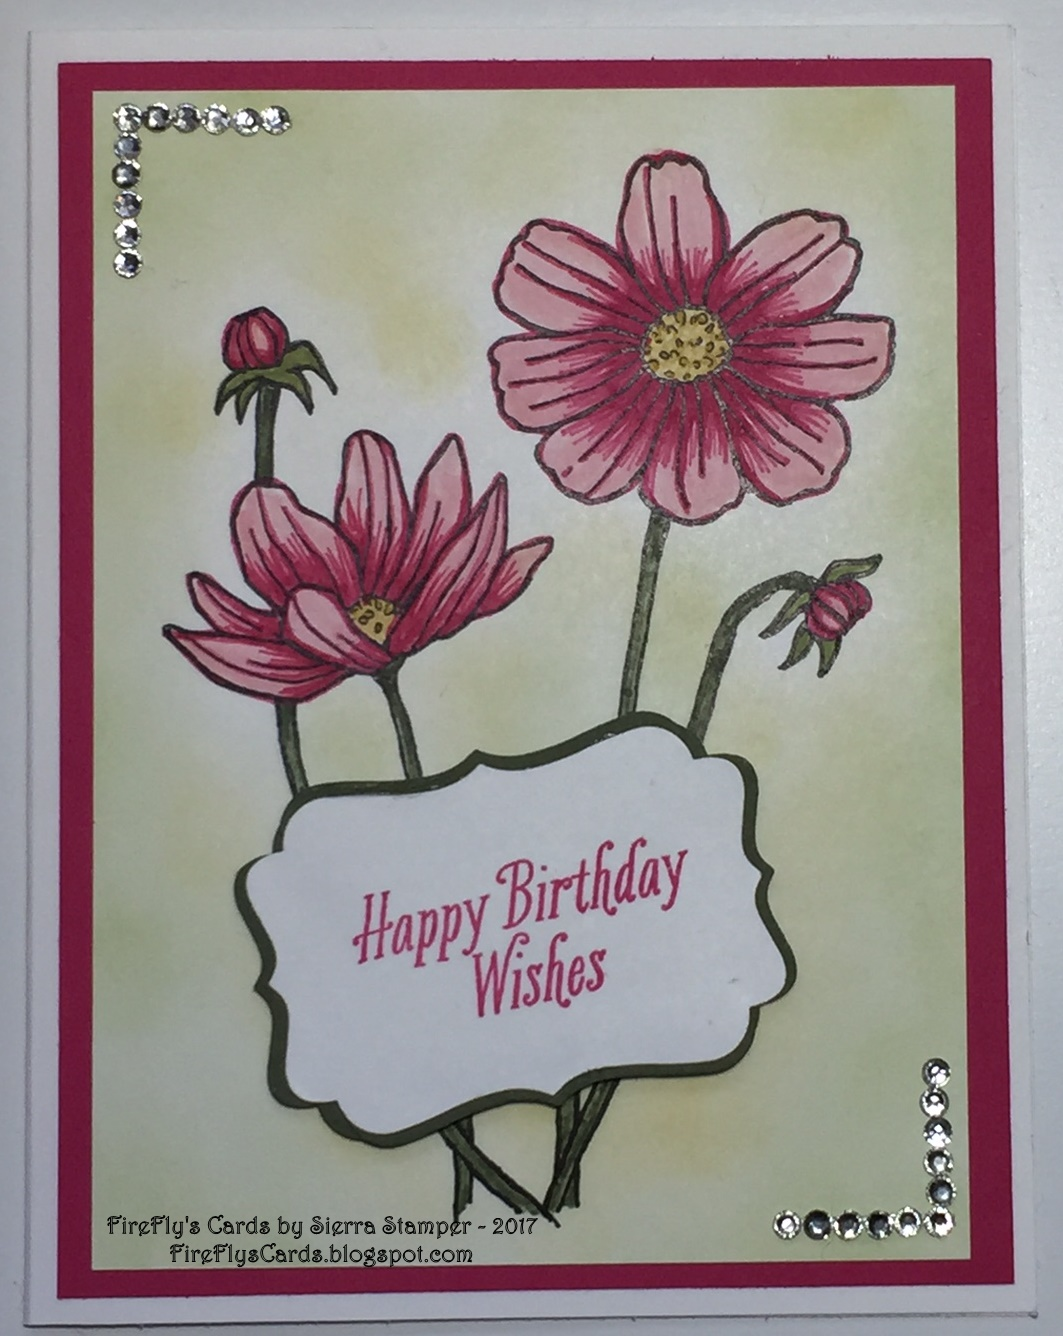 Fireflys Cards By Sierra Stamper Happy Birthday Wishes